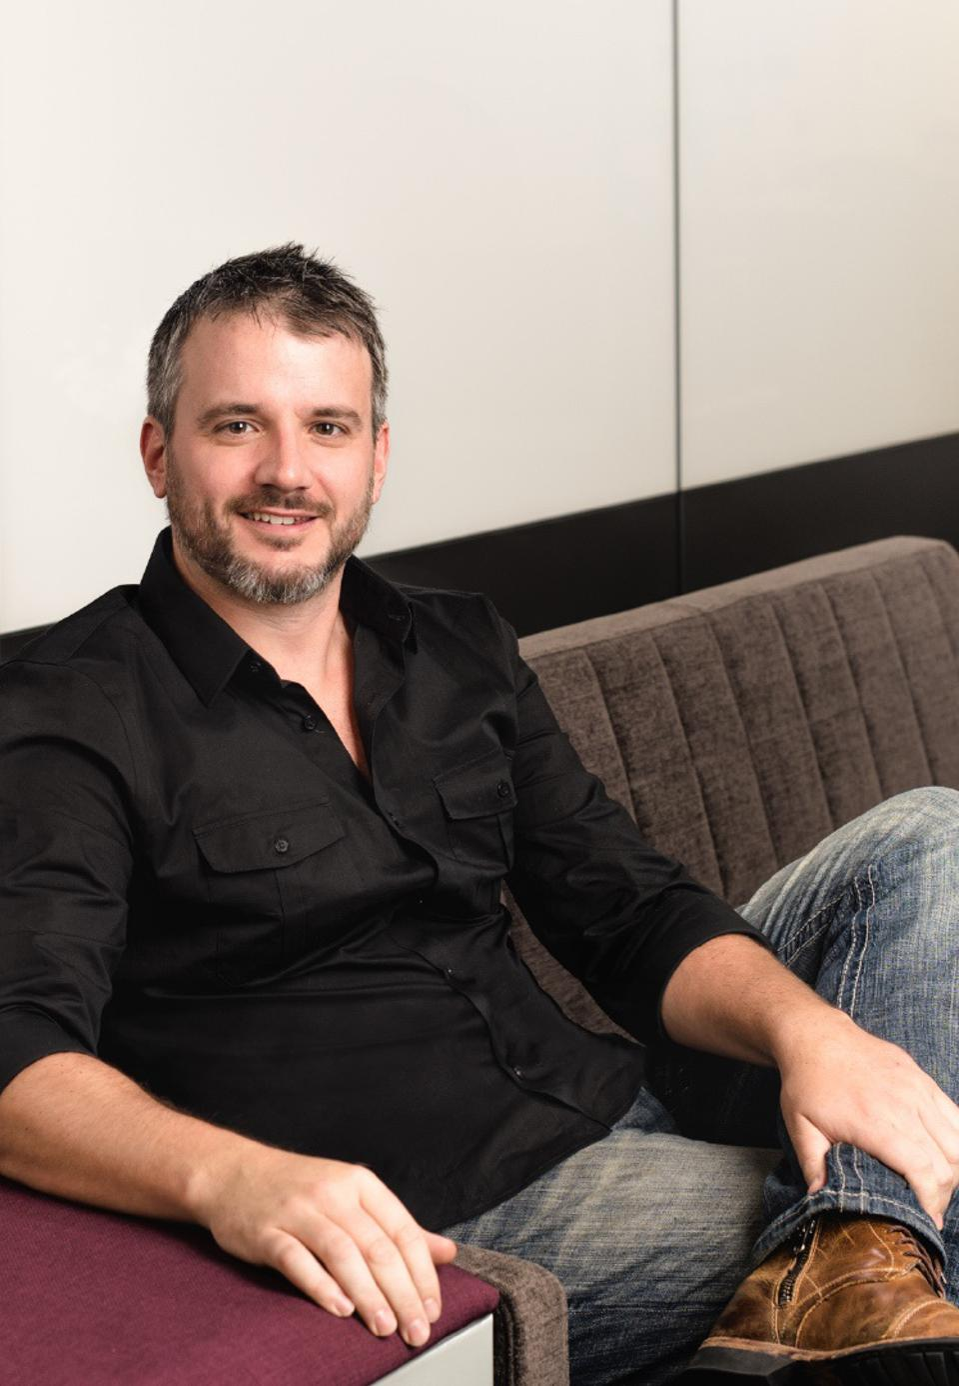 Headshot of Chris Kent, Director of Product Marketing at HashiCorp